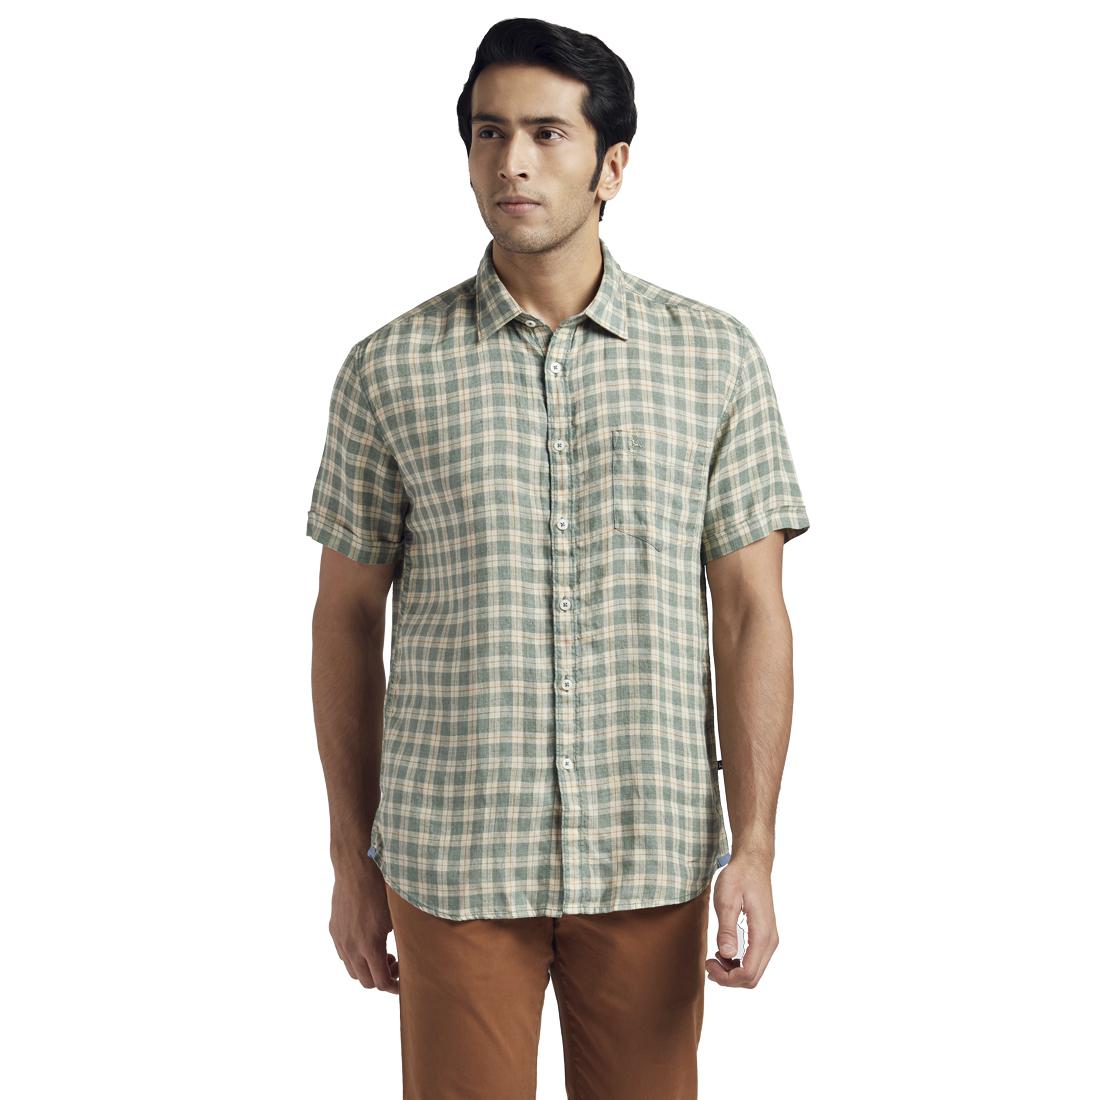 PARX | PARX Dark Green Shirt